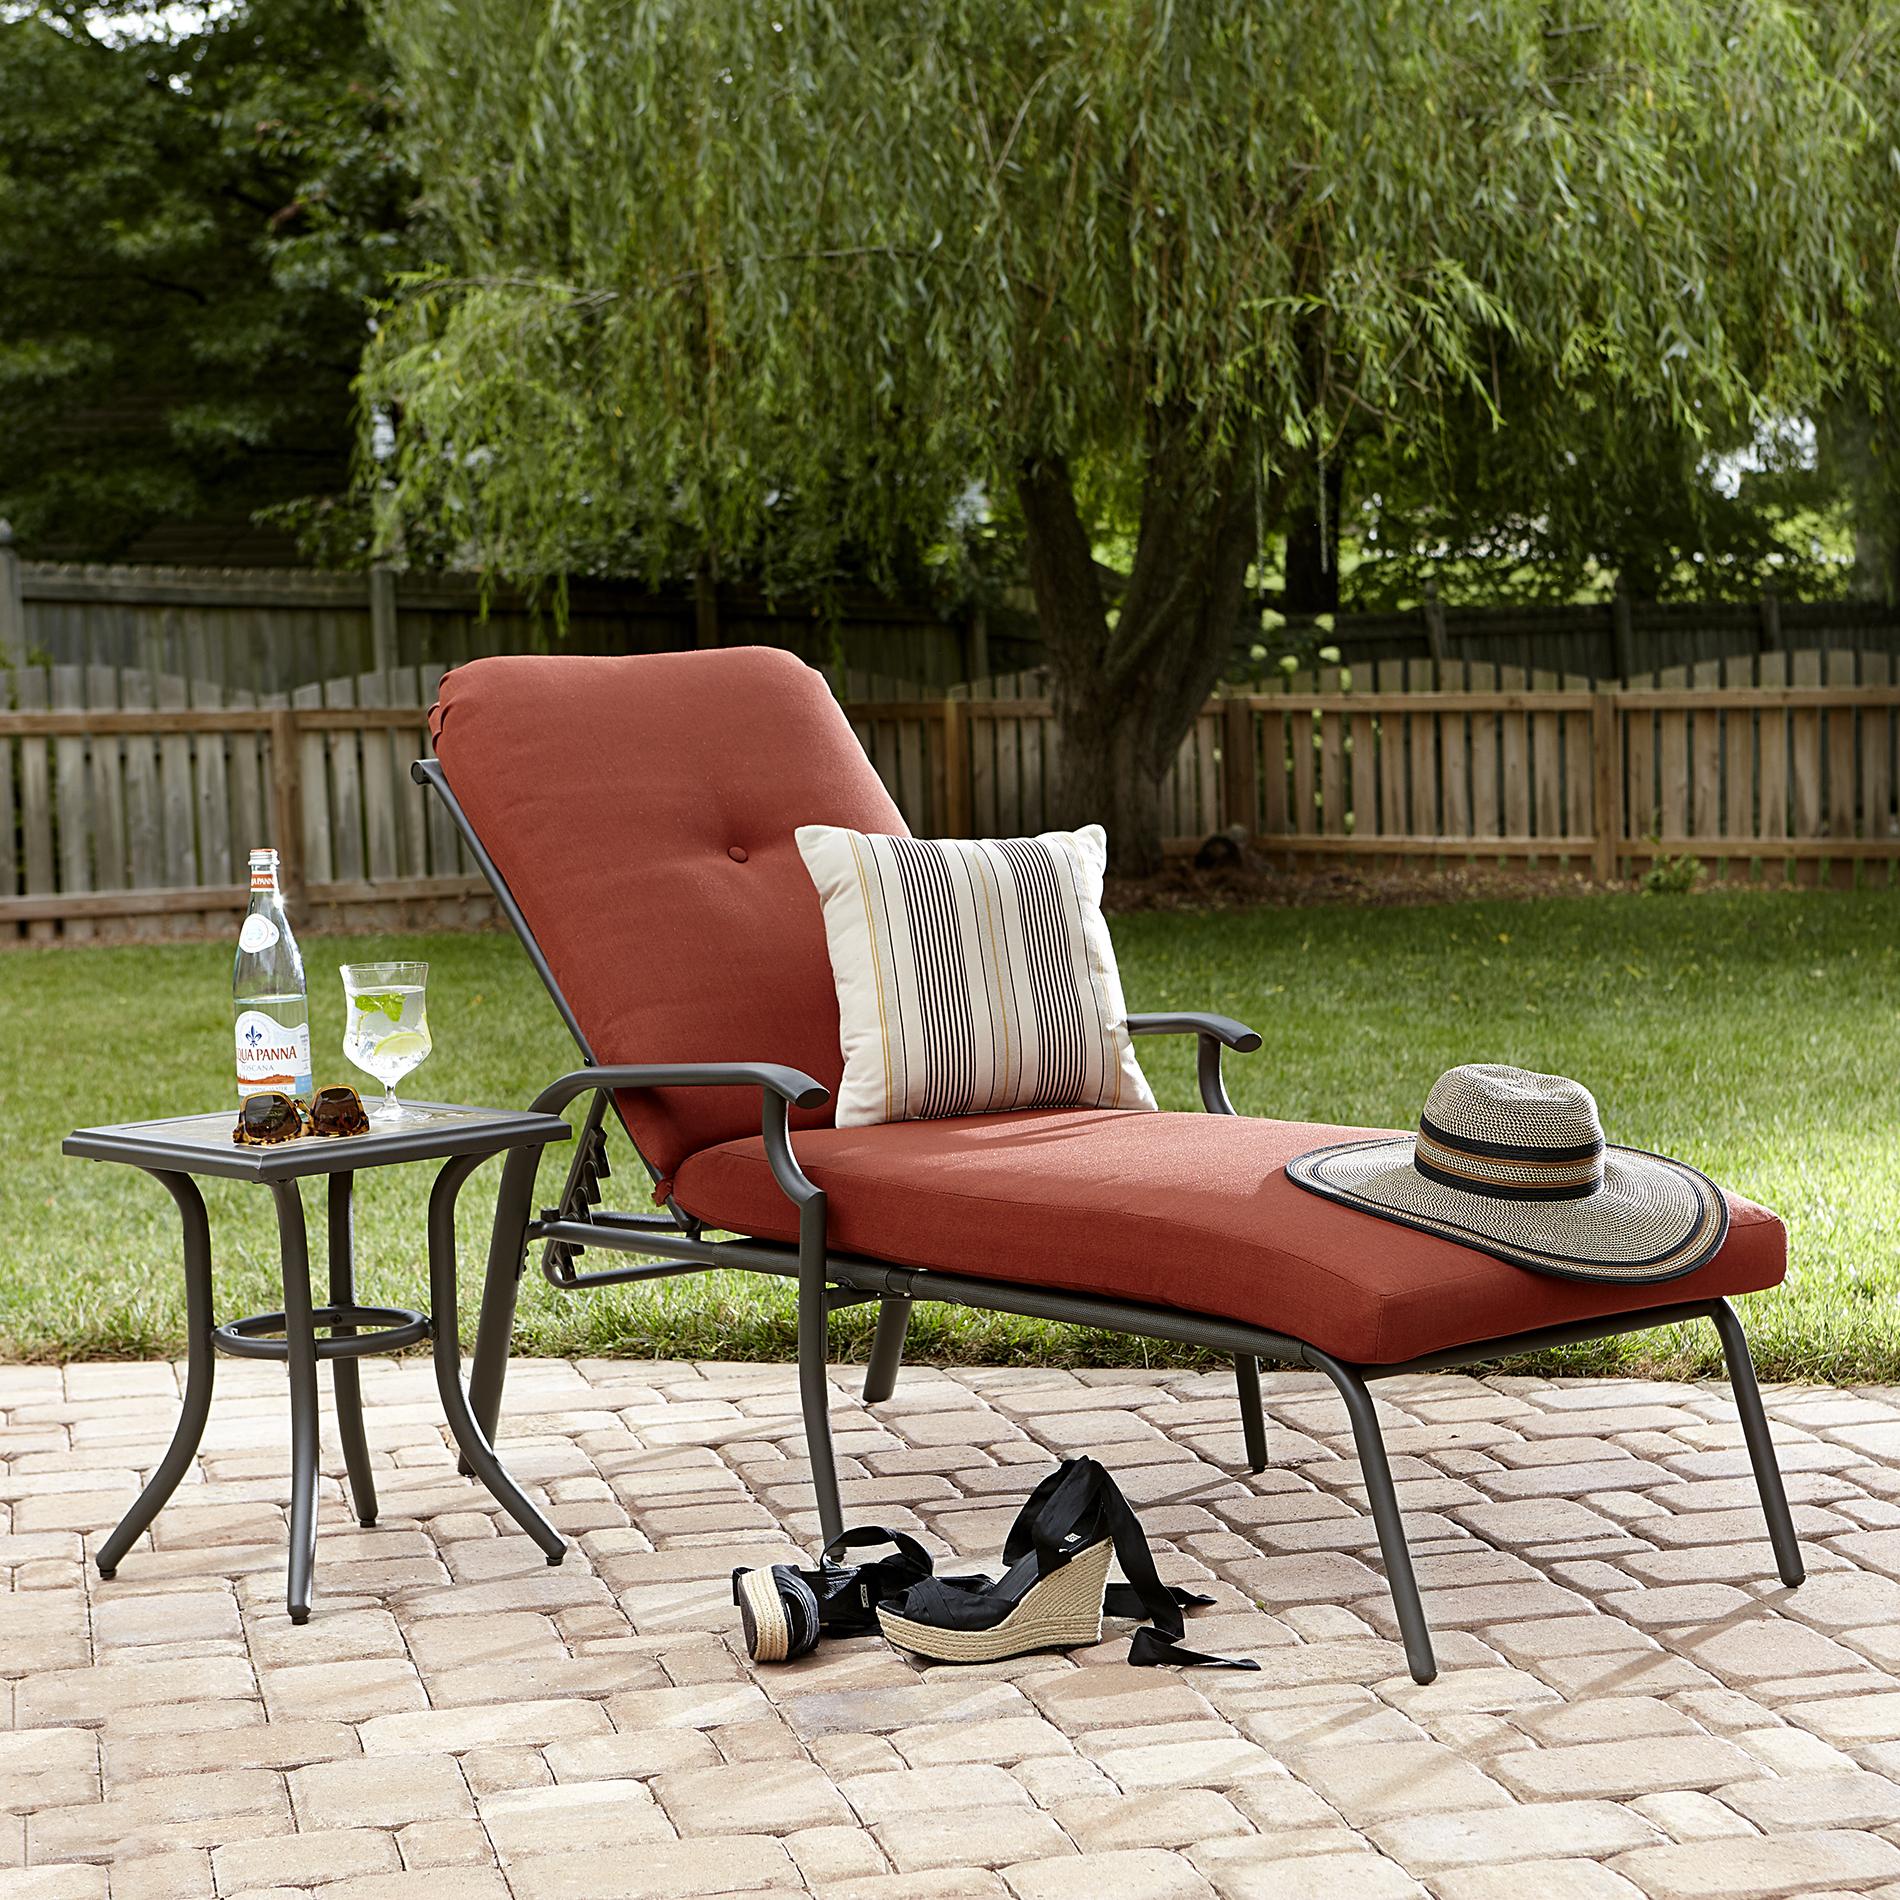 sun lounge chairs kmart yellow fabric desk chair garden oasis brookston chaise terracotta